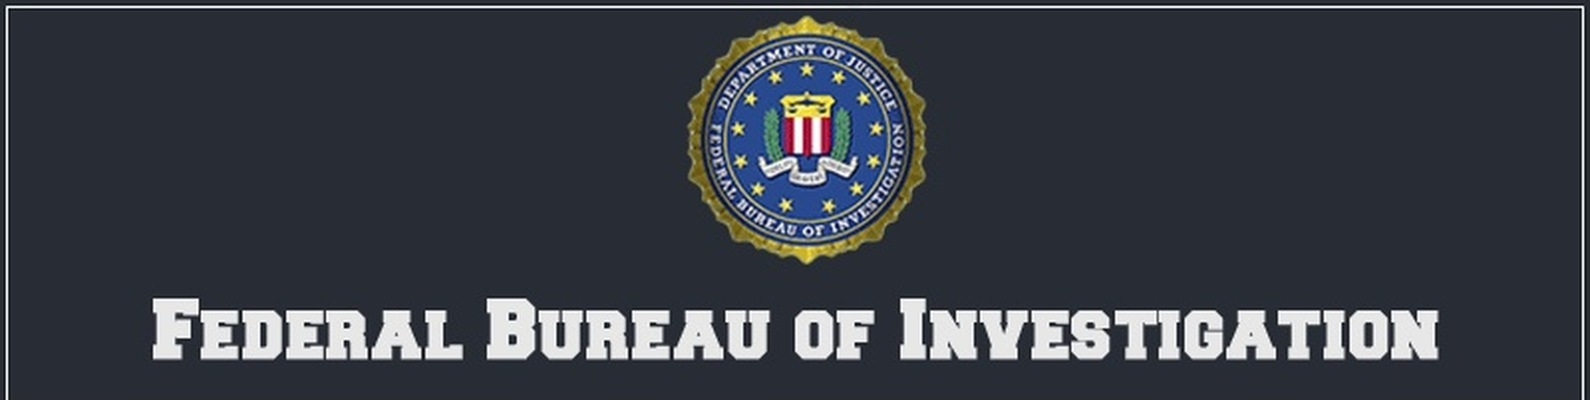 Xxx fbi agent sex images free fbi agent adult photo clips